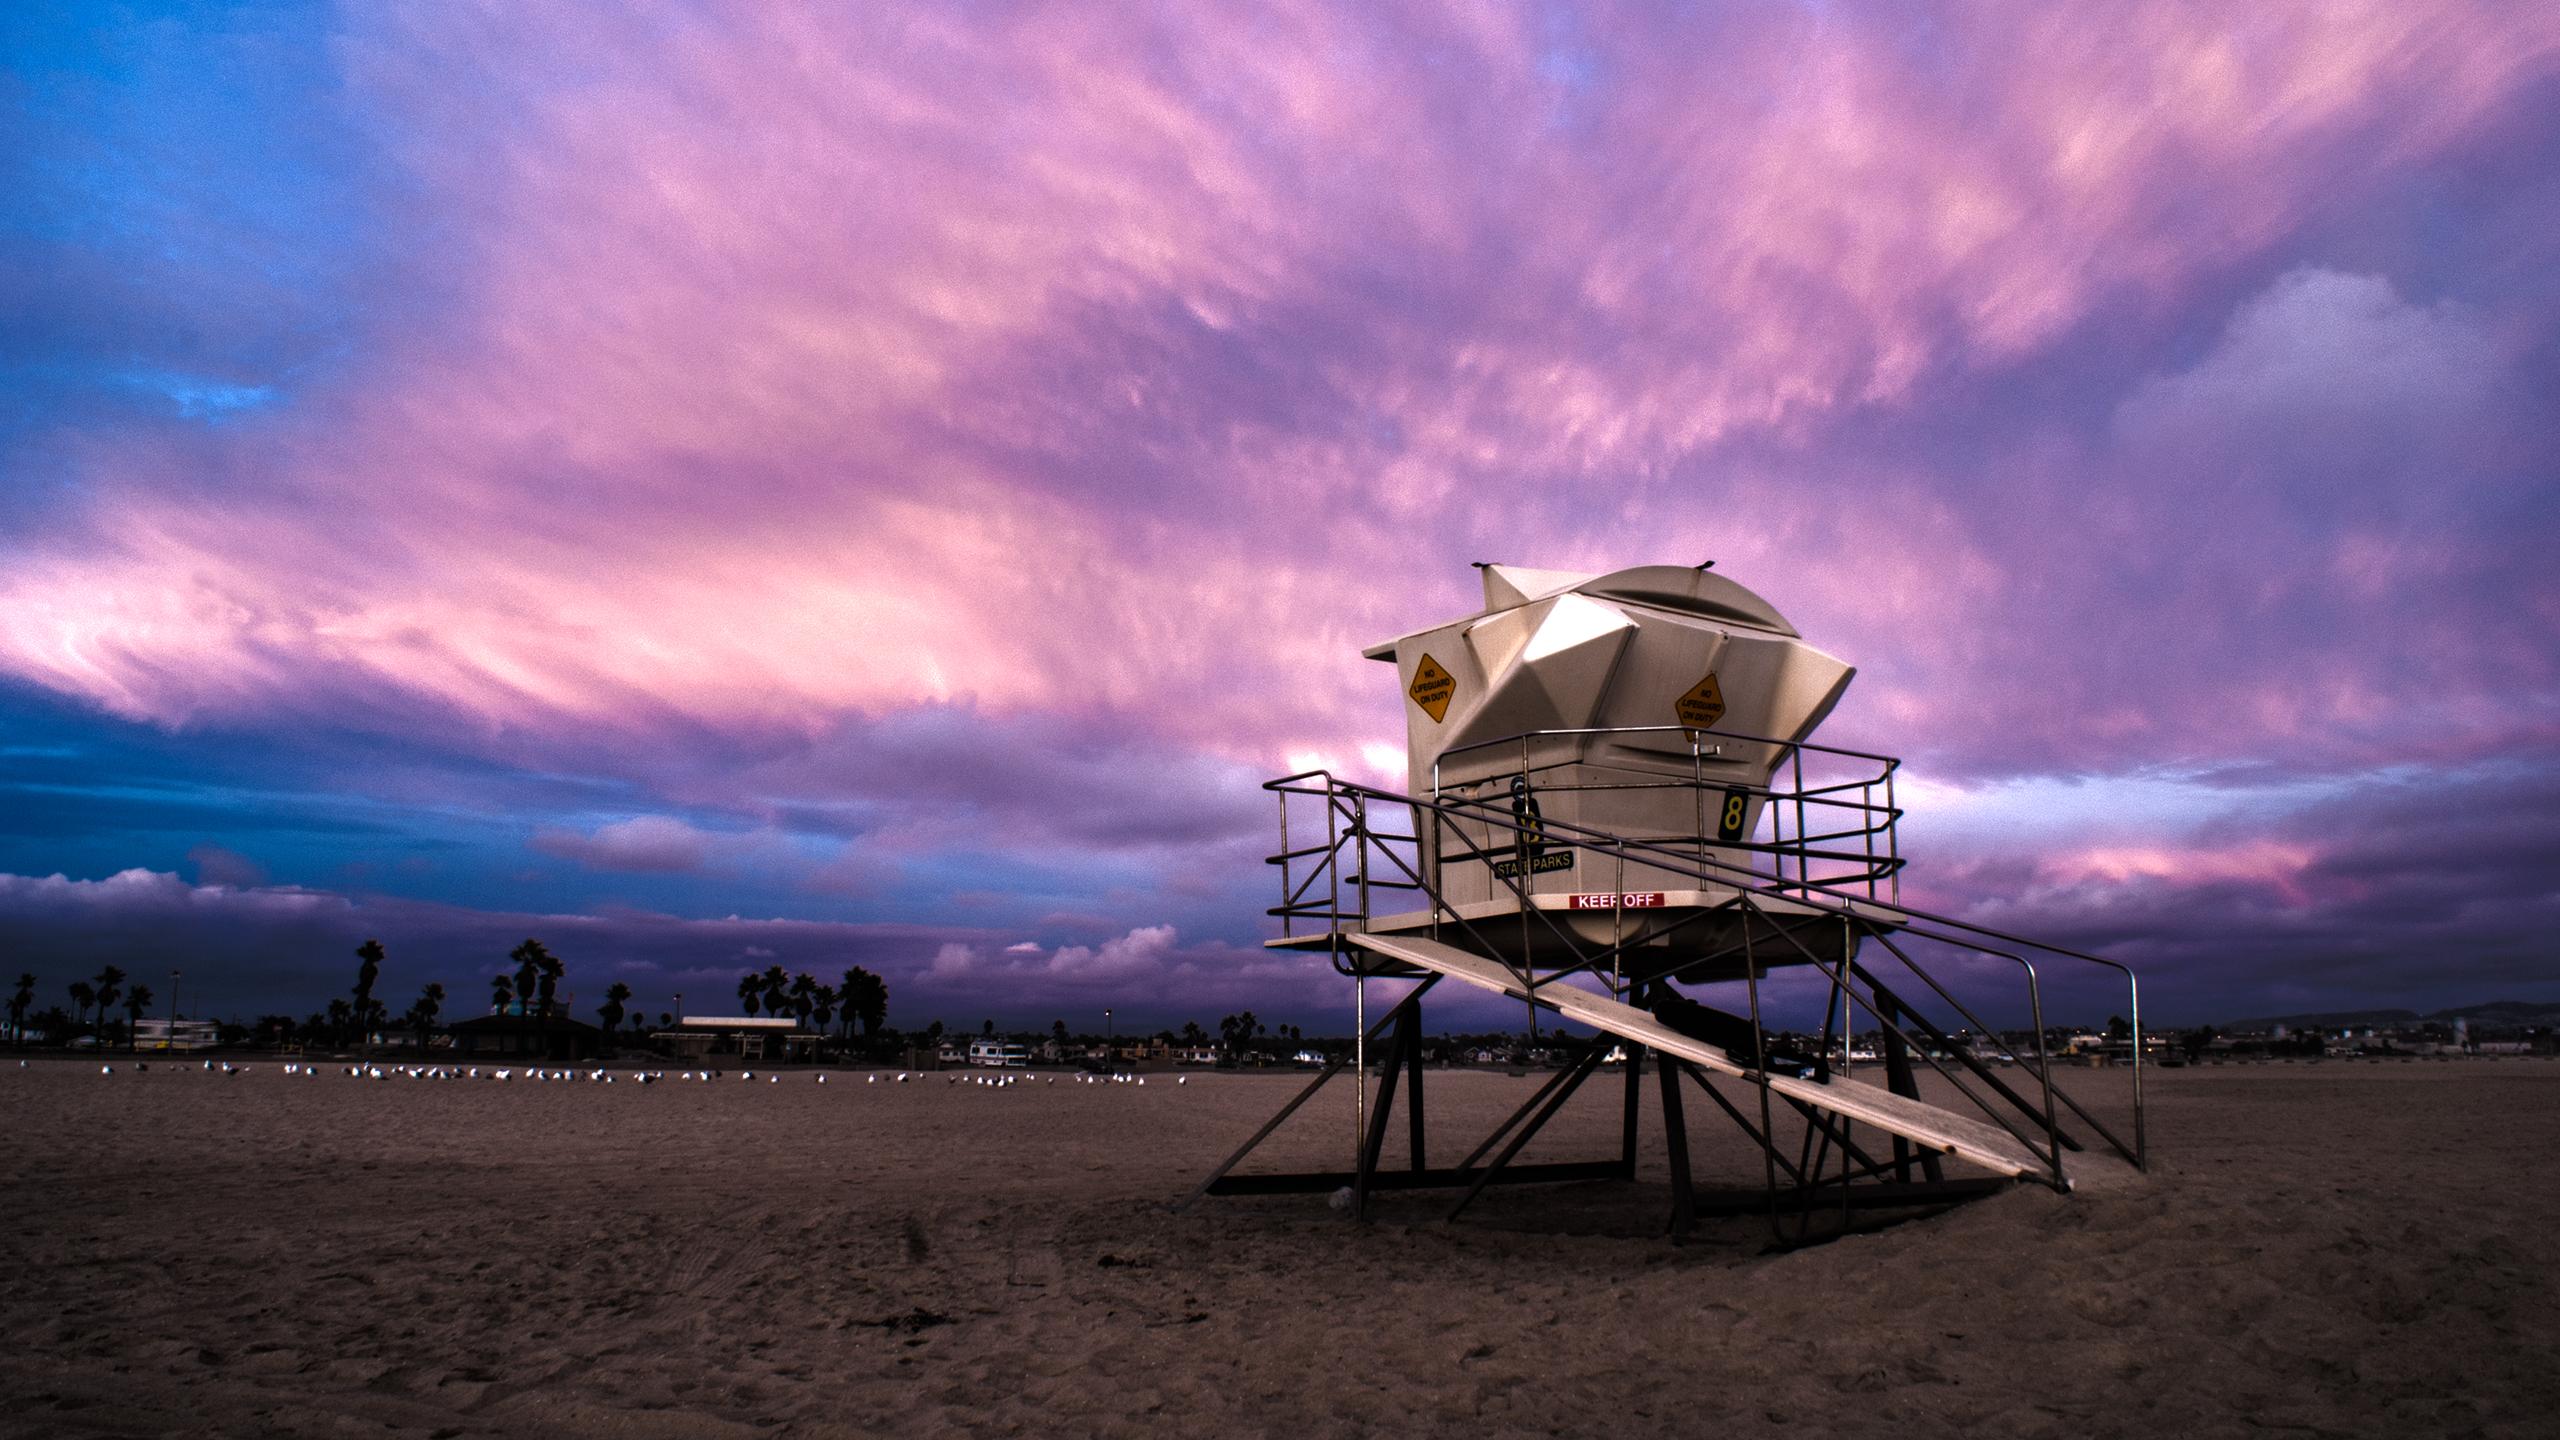 beach_storm_2560x1440